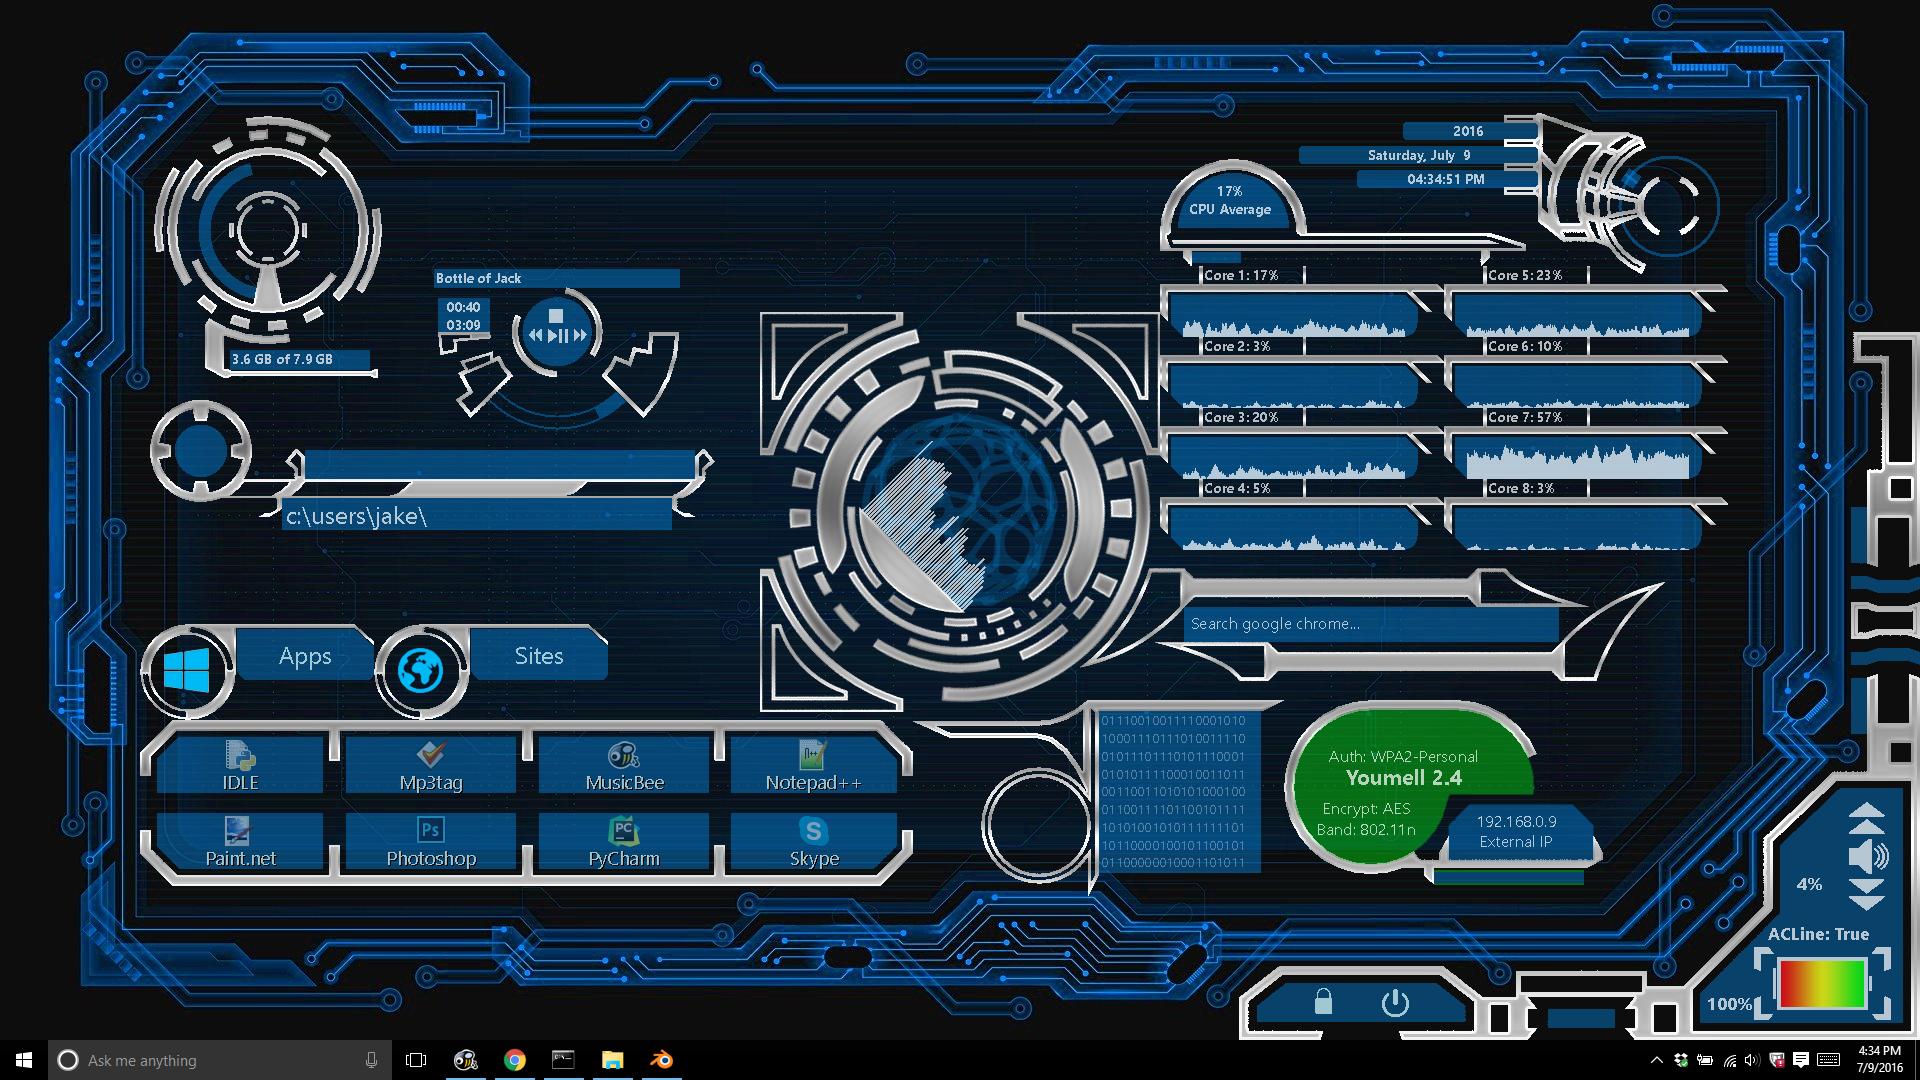 Rainmeter Futuristic/High Tech UI Theme By Jake5225 On